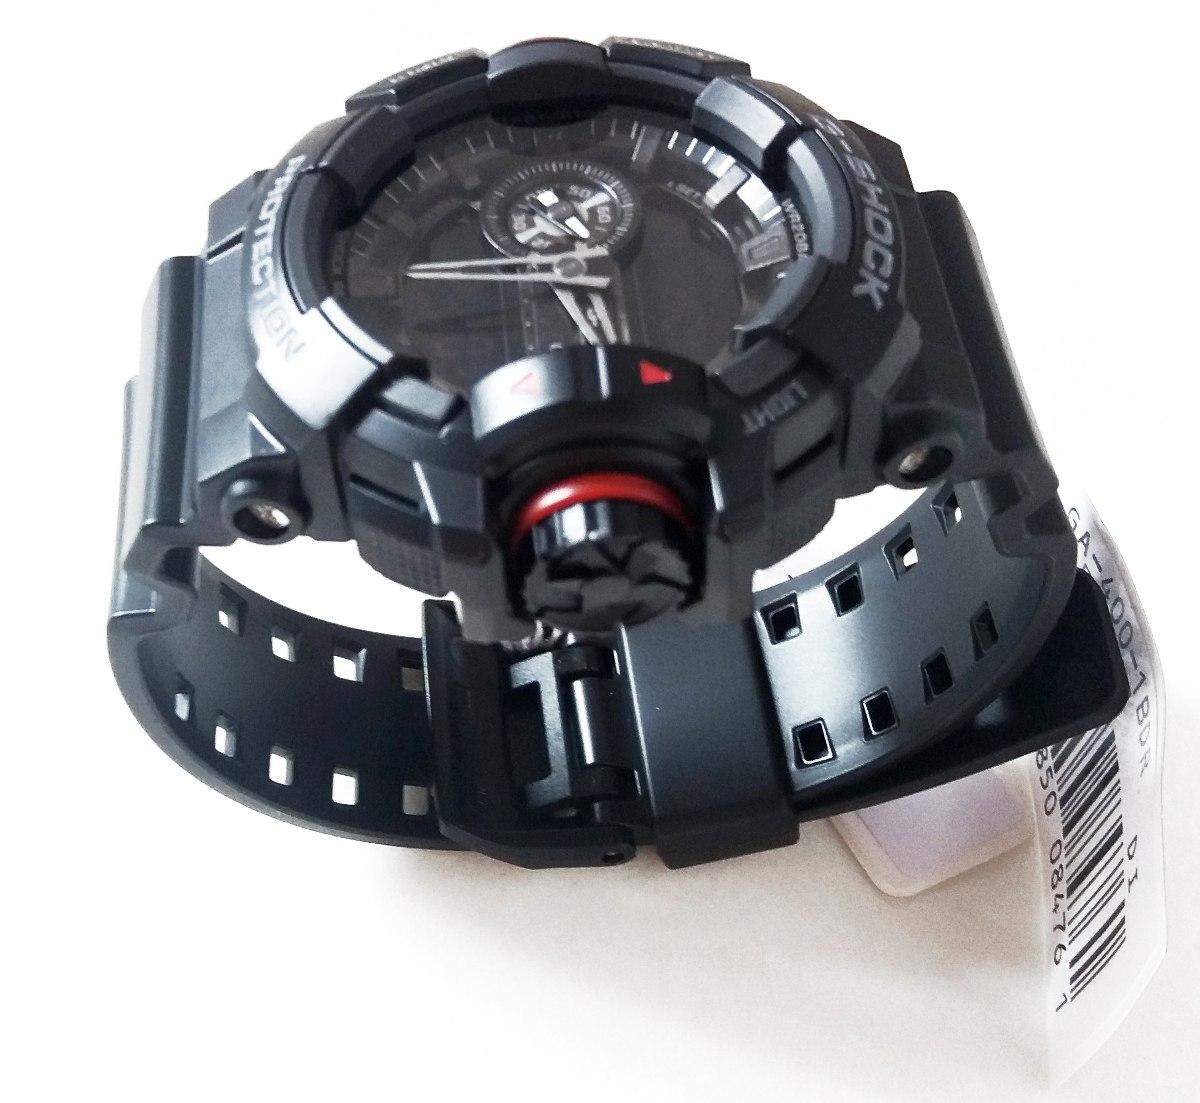 56f1225e601 relogio casio g-shock 20atm masculino esportivo preto novo. Carregando zoom.